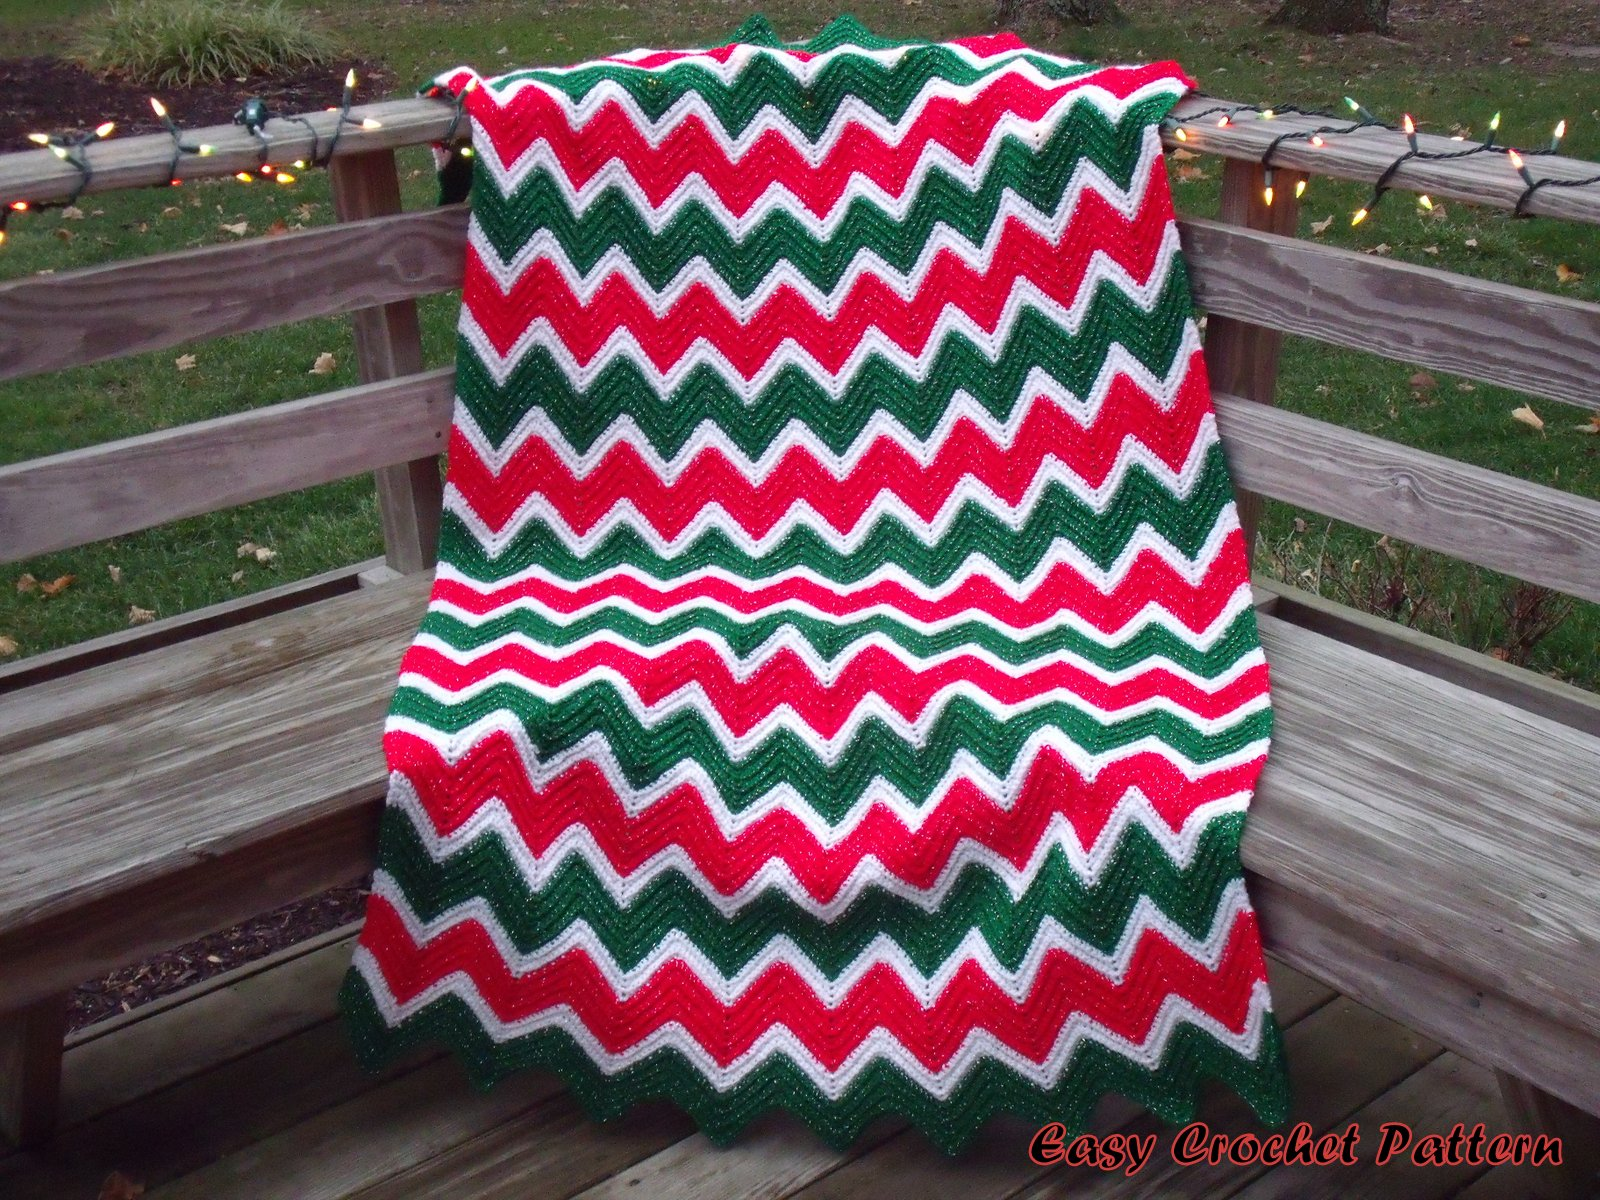 Easy Crochet Pattern Crocheted Christmas Afghans And Tree Skirt